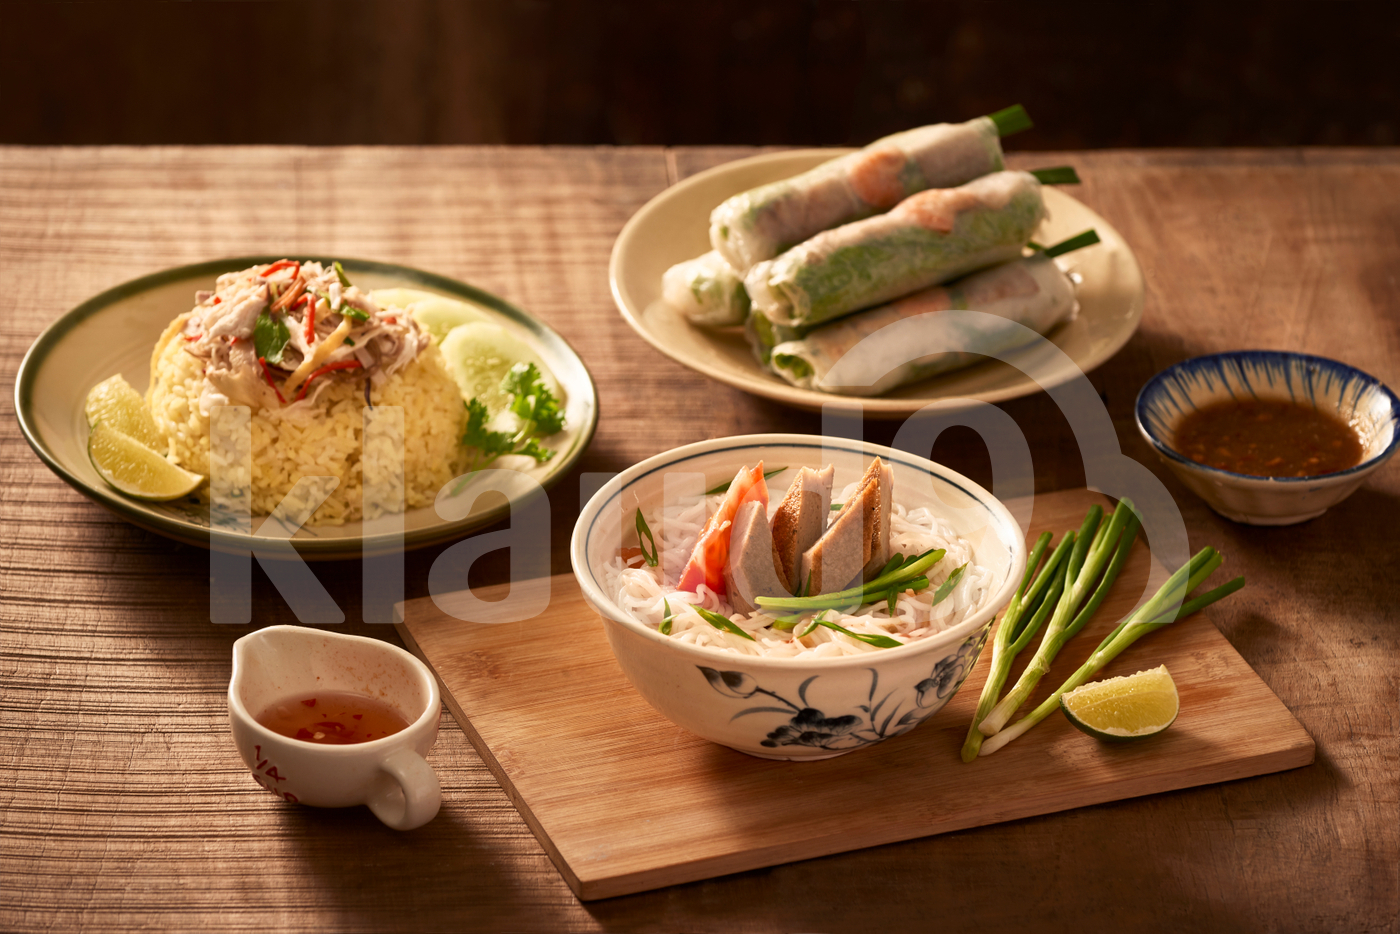 Assorted asian dinner, vietnamese food. Chicken rice, bun cha ca, noodles, spring rolls